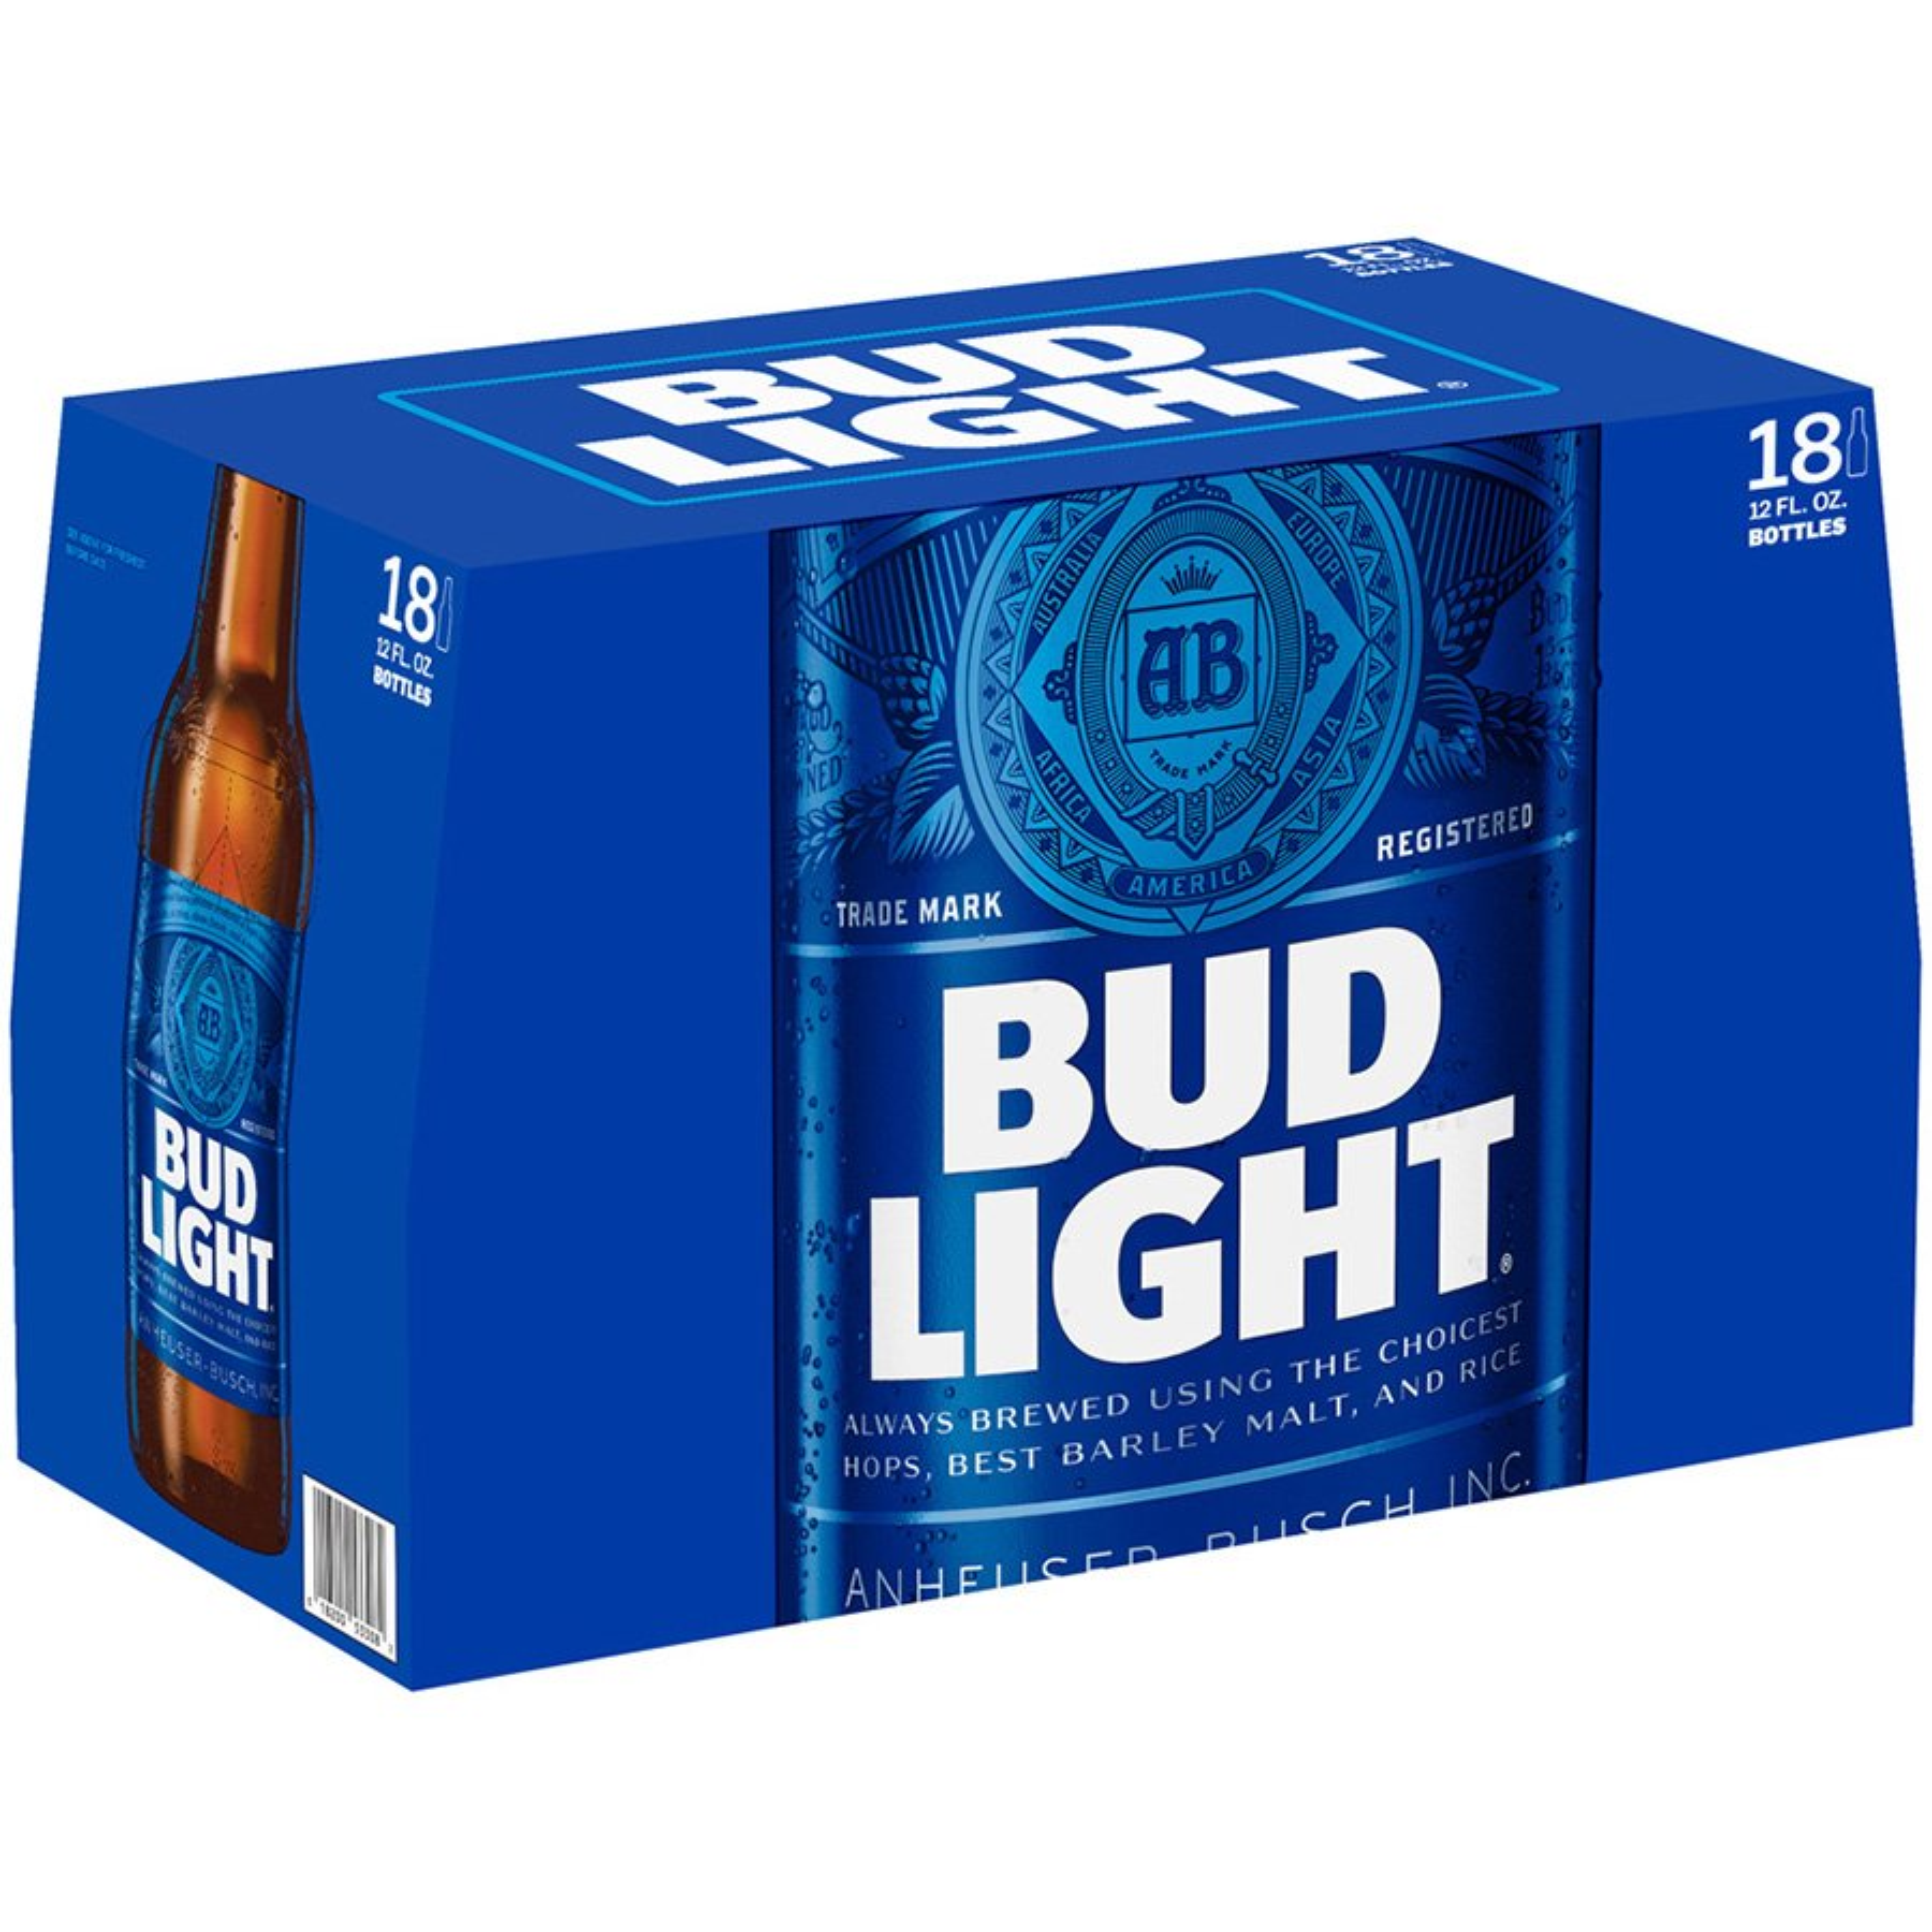 Perfect Bud Light Beer 12 Oz Bottles U2011 Shop Beer At Hu2011Eu2011B Awesome Ideas